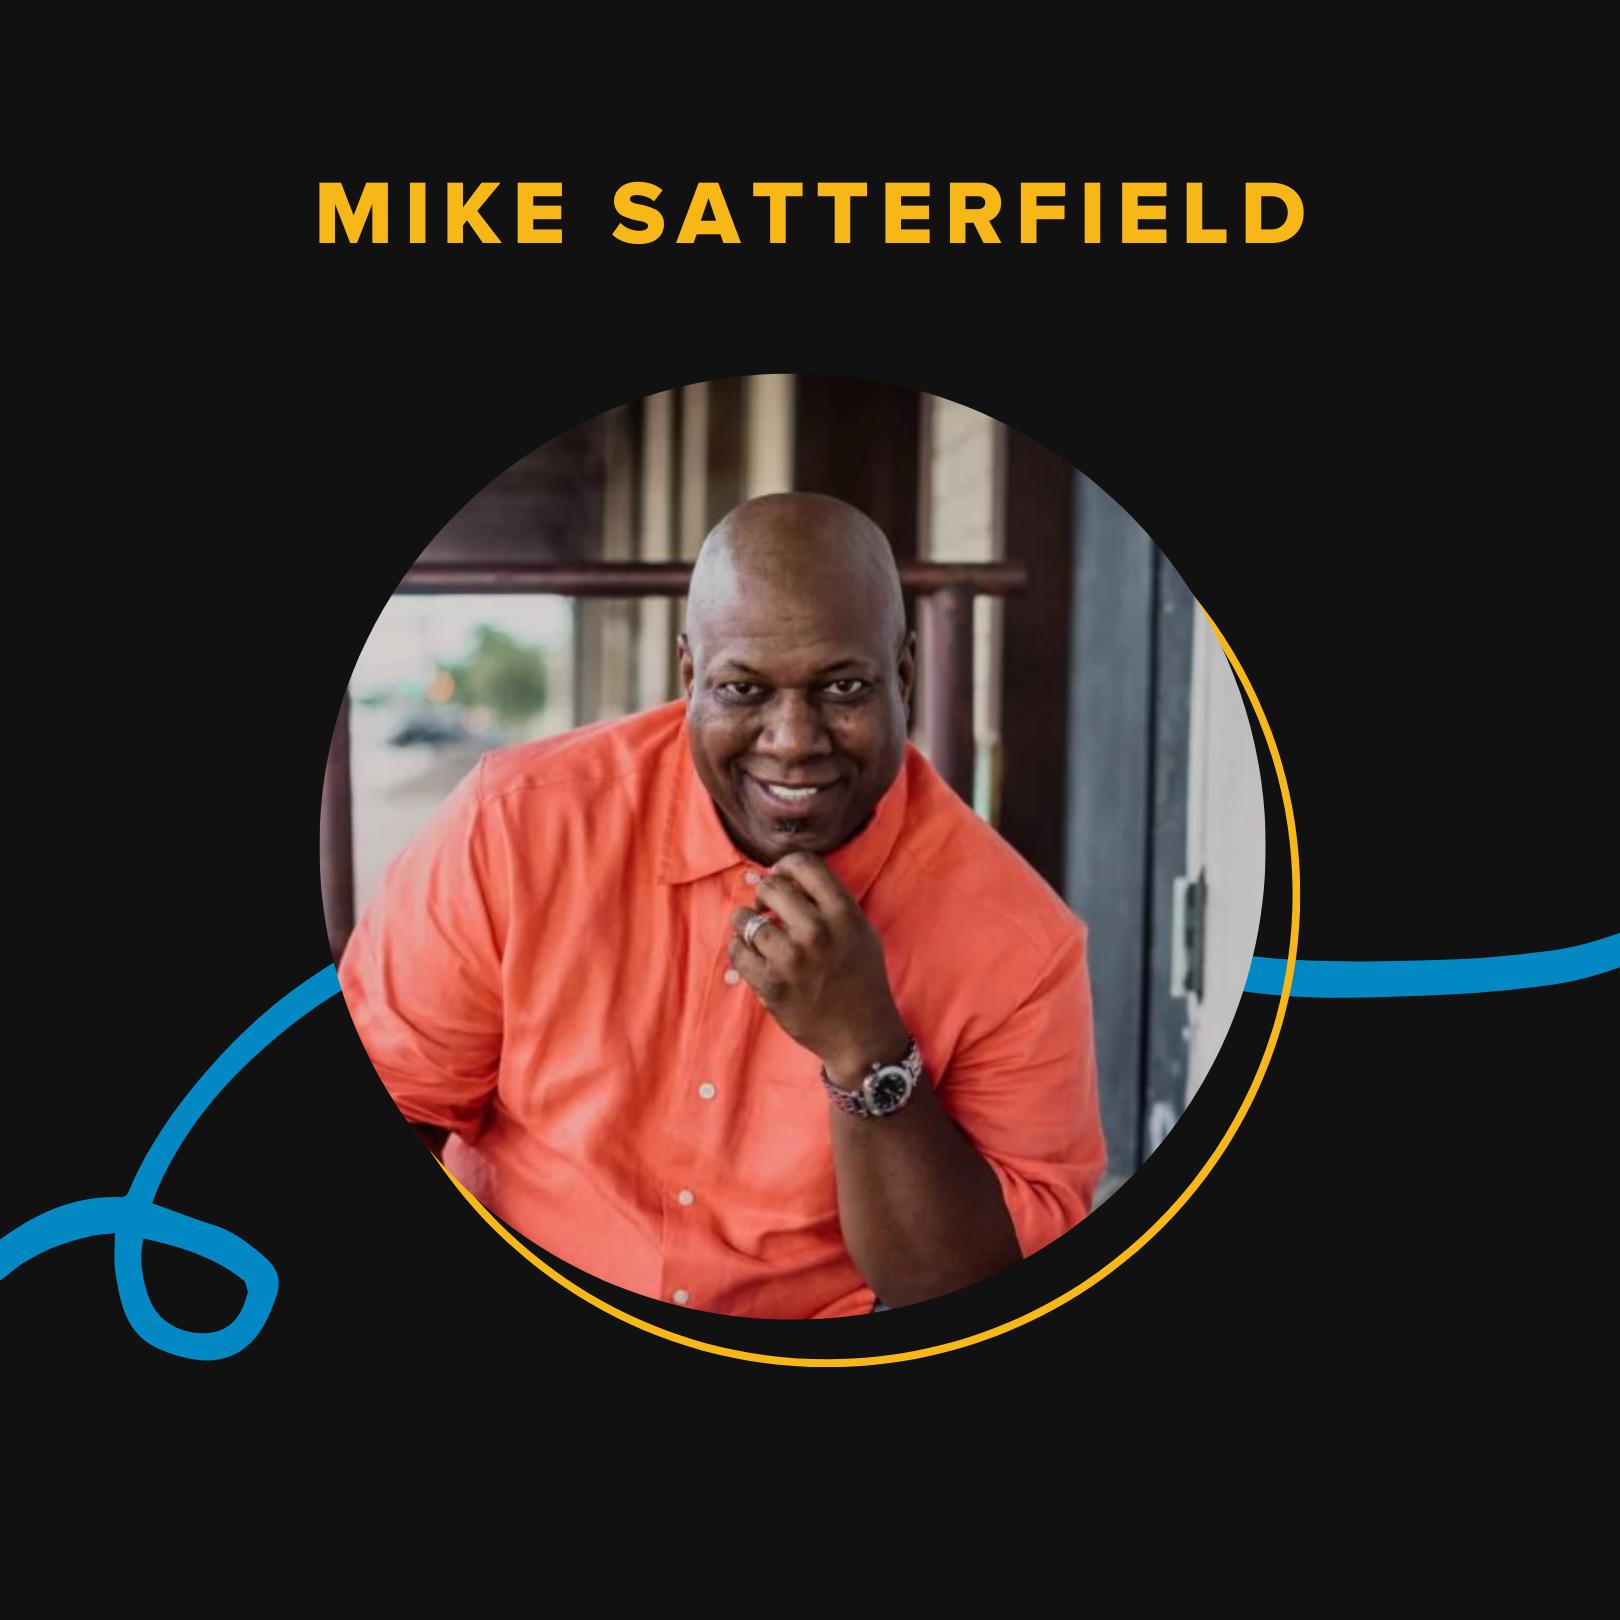 Mike Satterfield